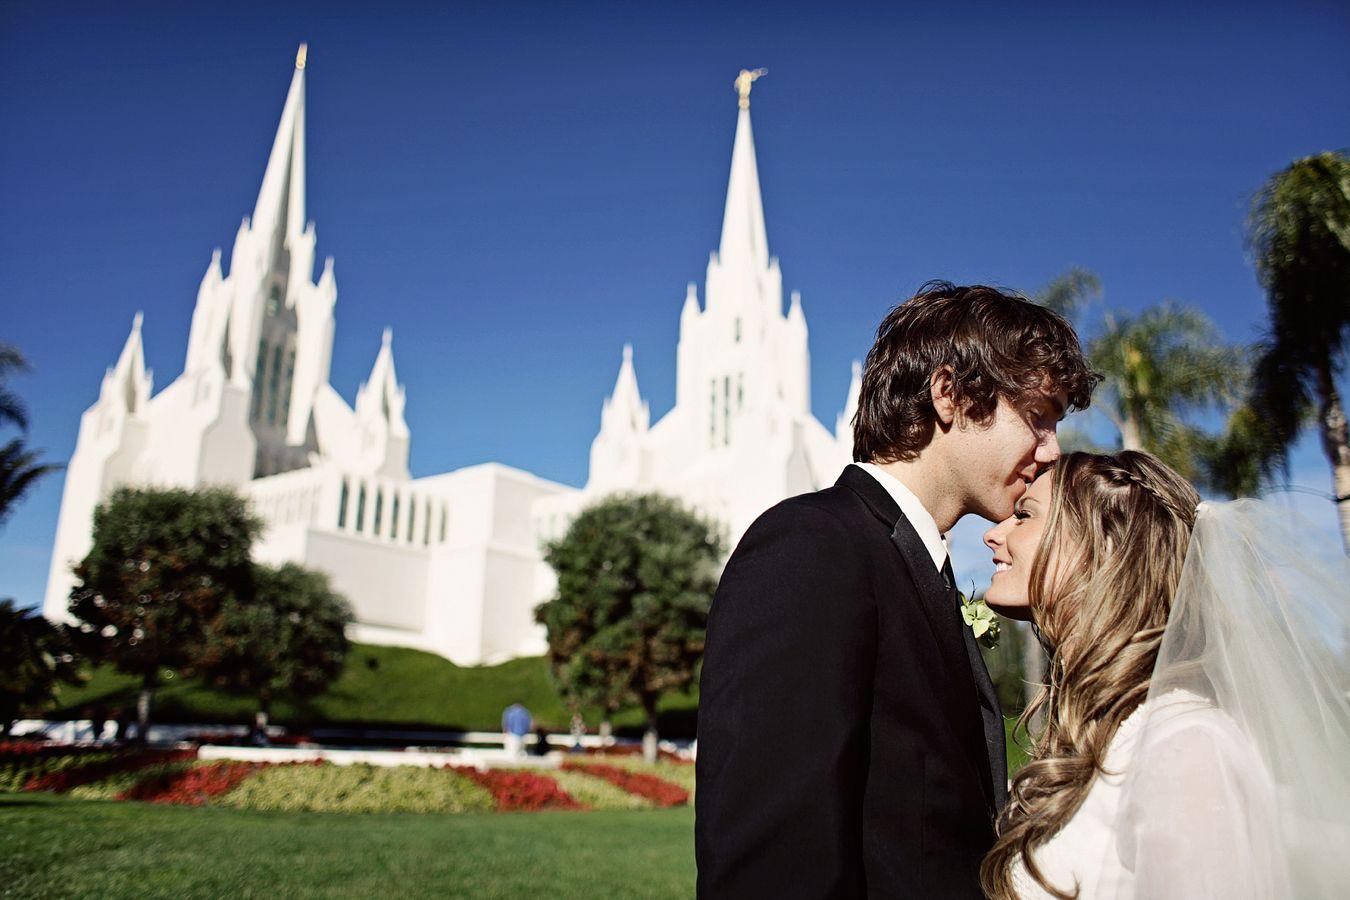 LDS Temple Wedding Lds Bride Groom Ready Dress Mormon DoctrineSan Diego